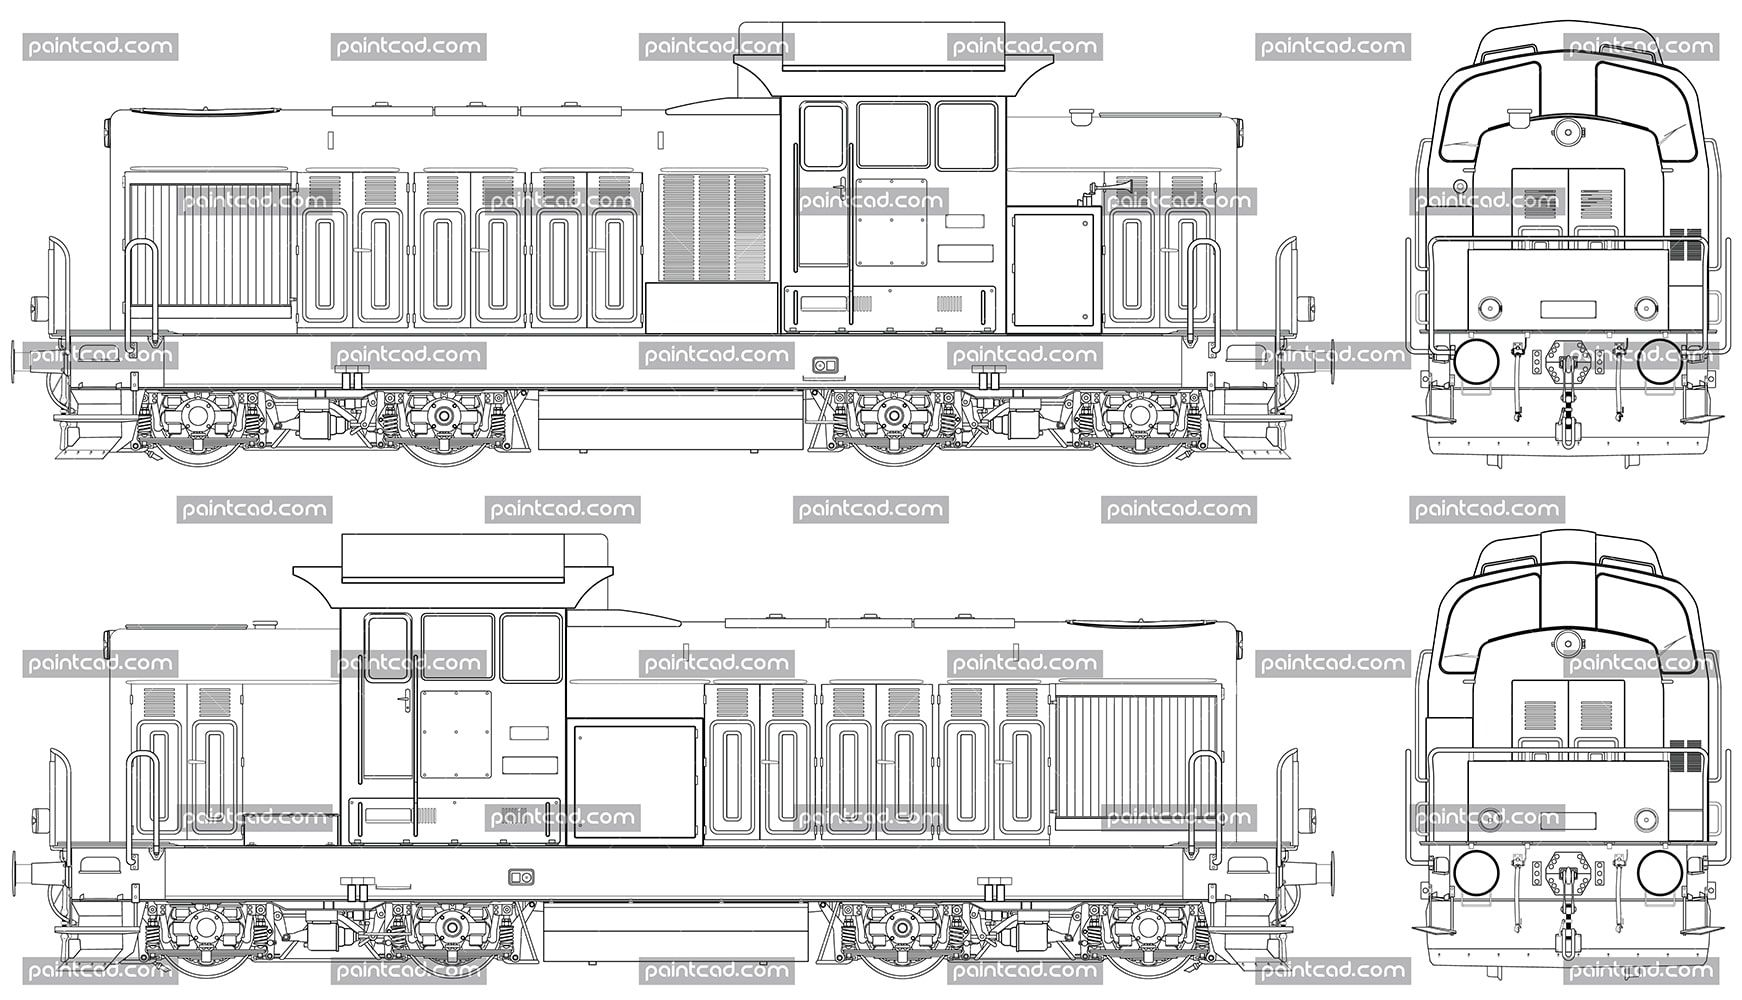 hight resolution of diagram of bulgarian diesel shunting locomotive ldh 125